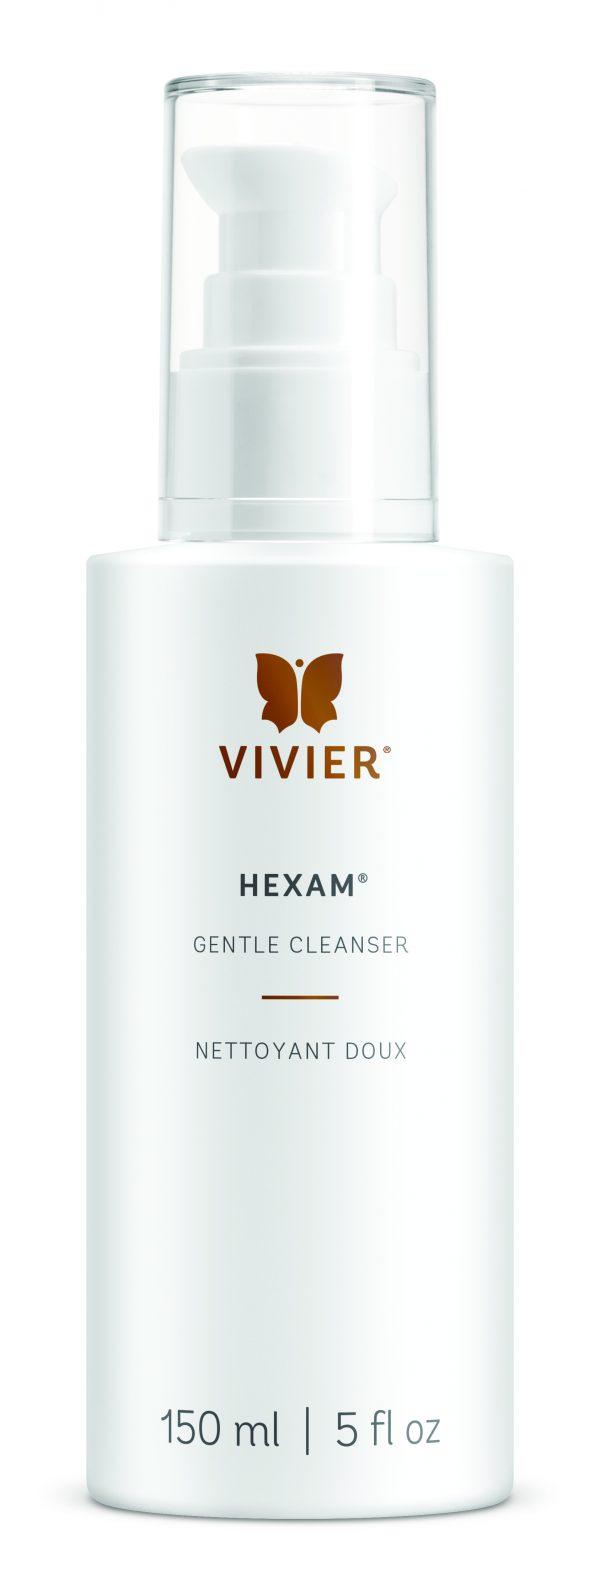 Vivier Hexam   Rejuvenation Med Spa by Hill Dermatology Bartlesville Oklahoma